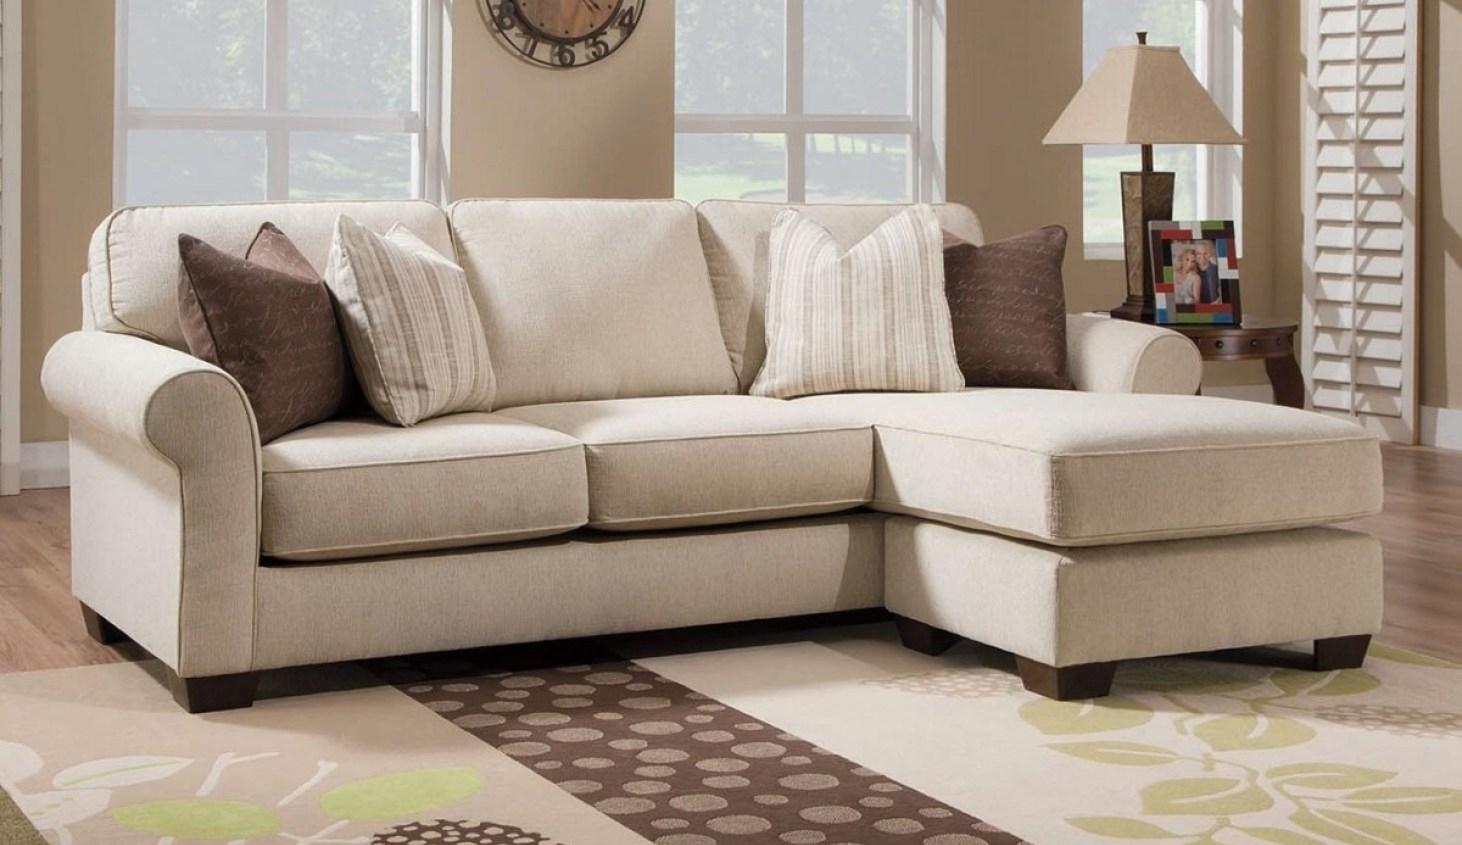 sofa austin tx microfiber washing machine 10 top sectional sofas at ideas